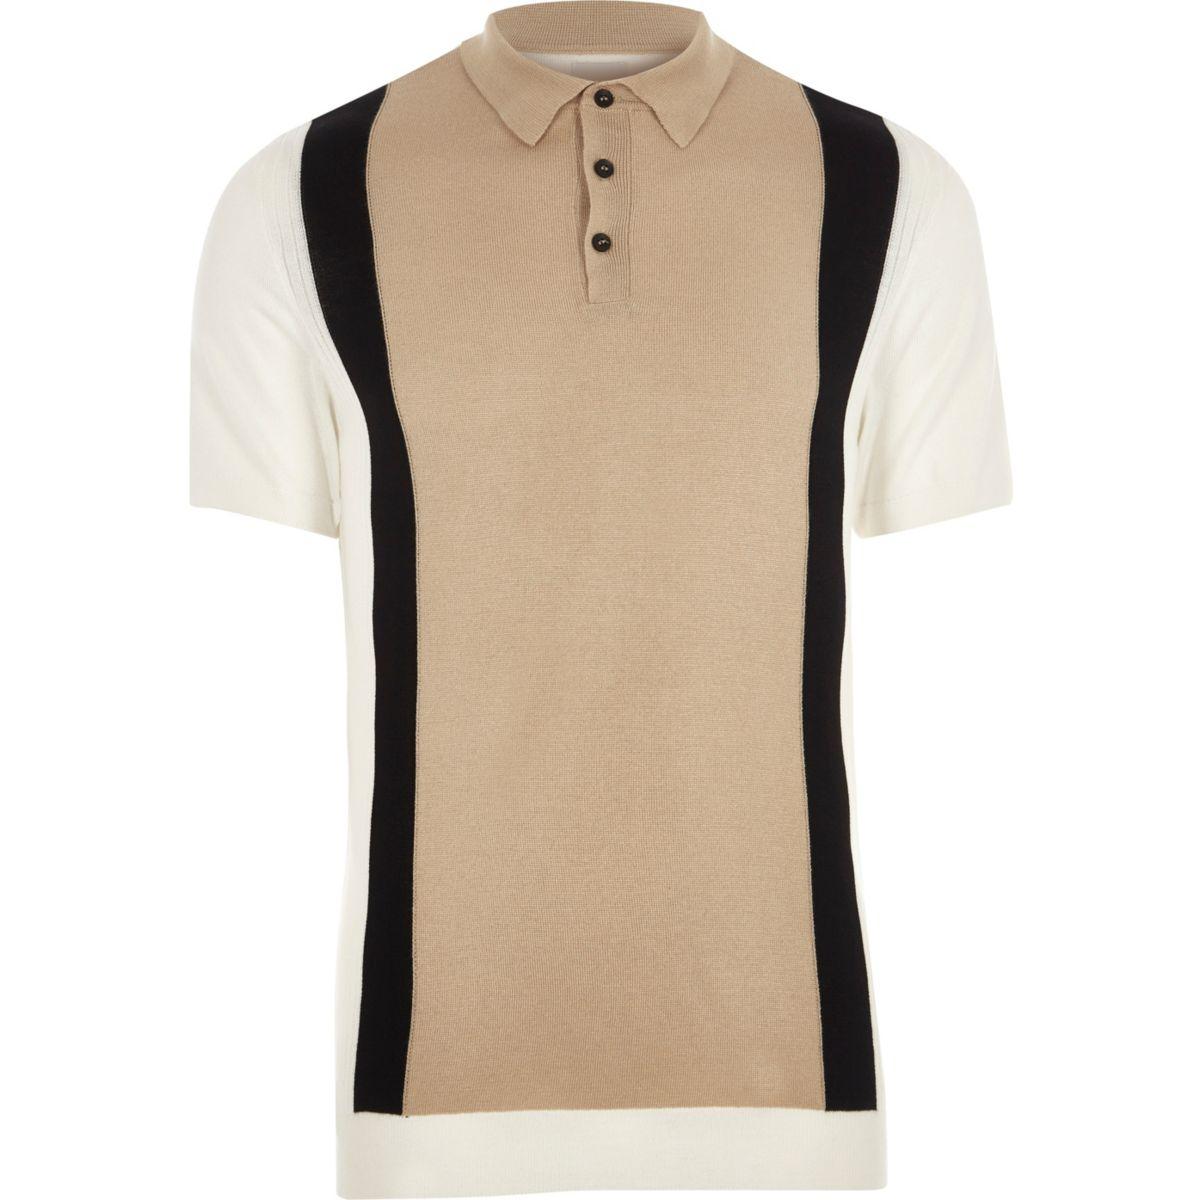 Cream knit blocked slim fit polo shirt